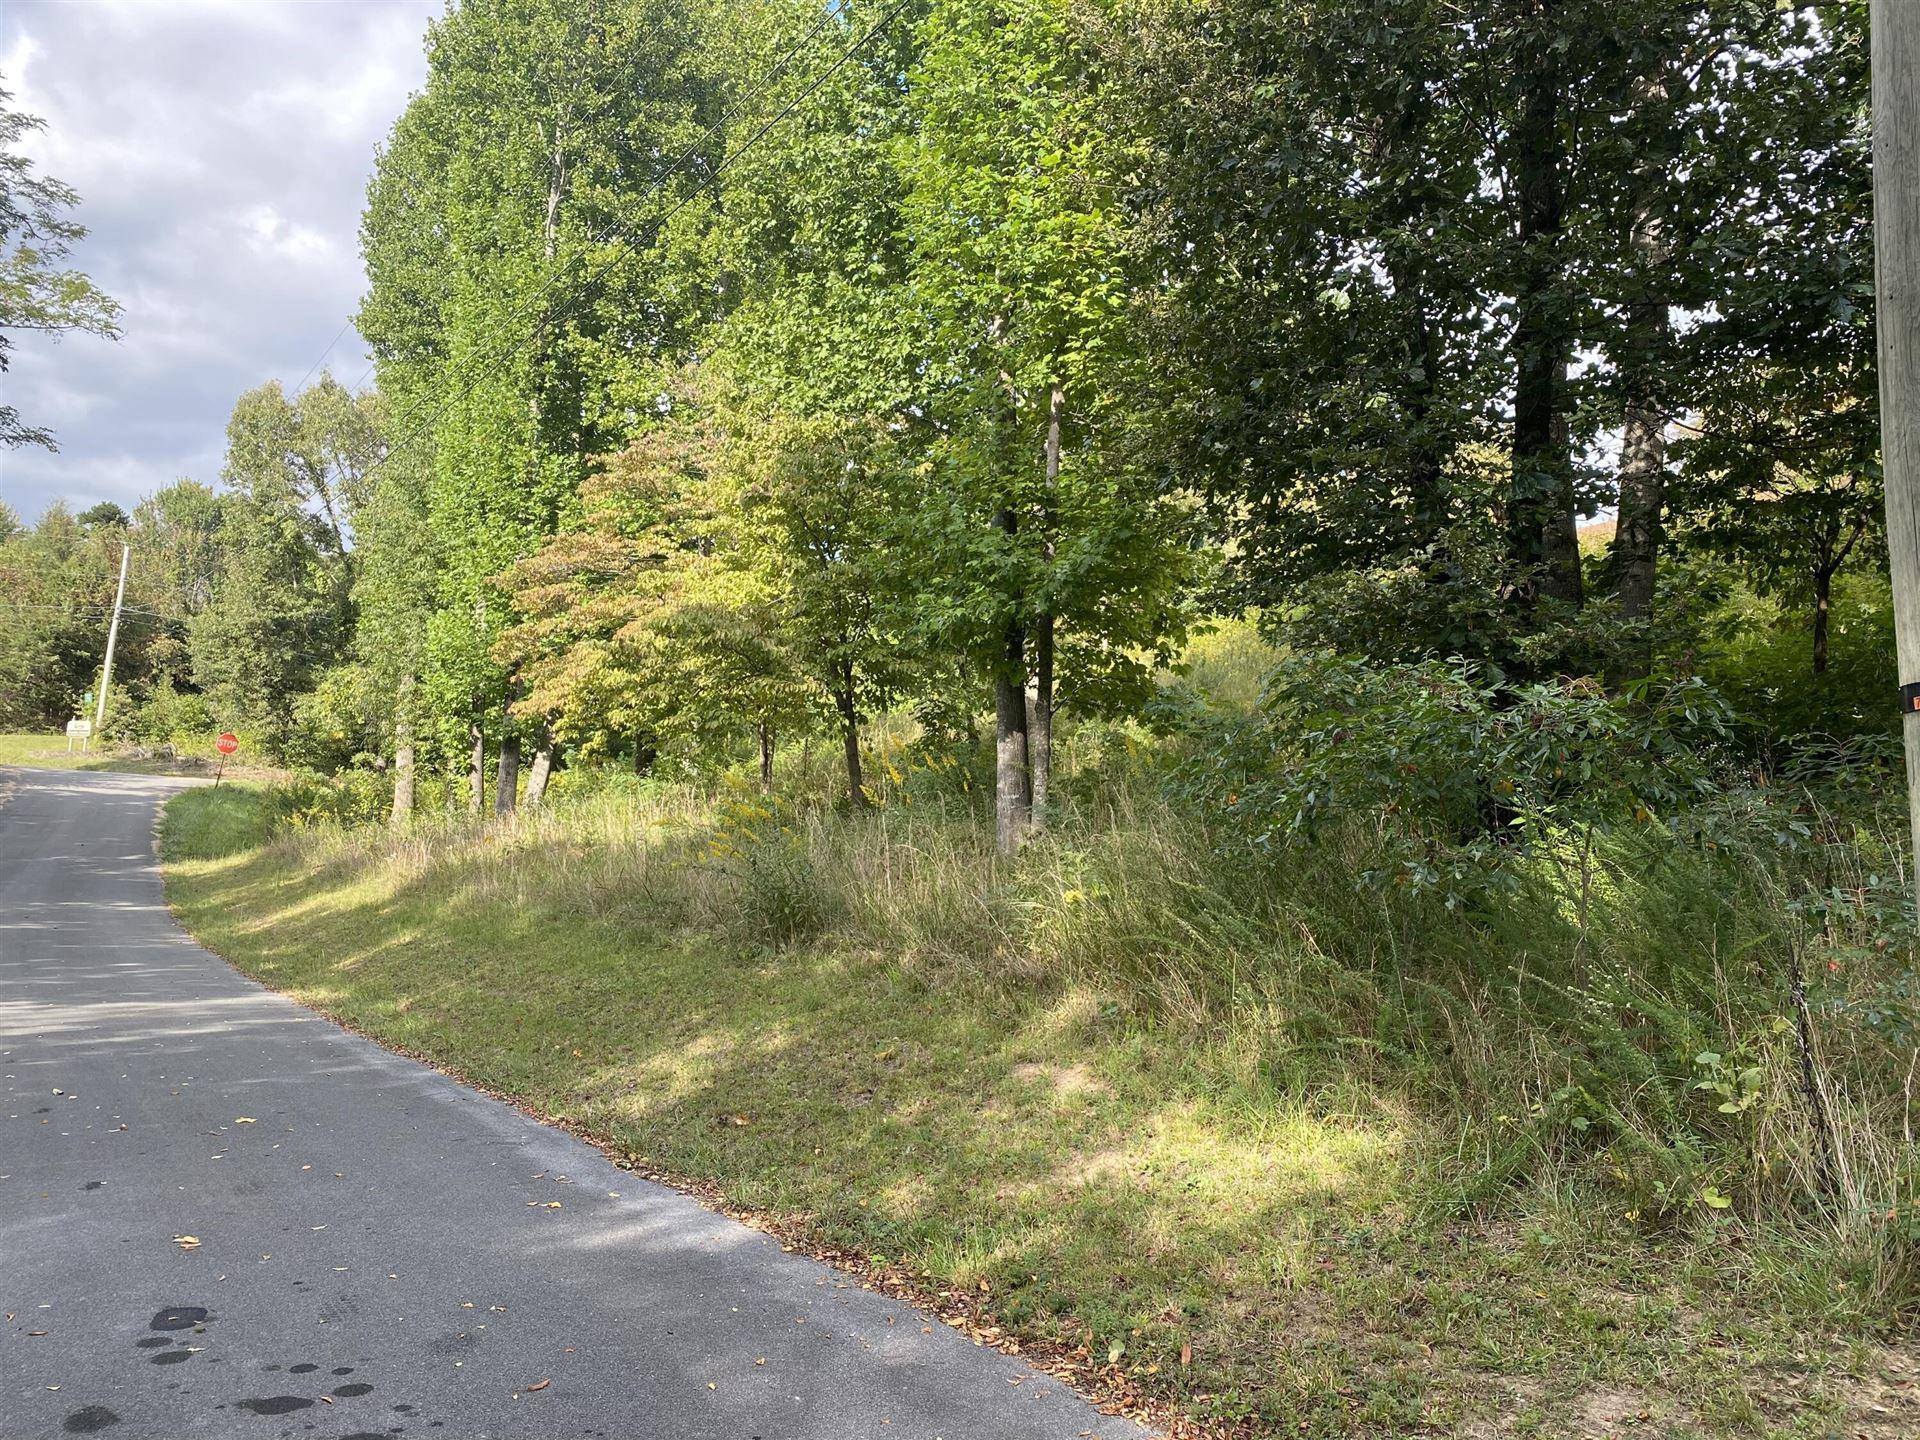 Photo of Tbd Sunview Lane, Elizabethton, TN 37643 (MLS # 9928567)